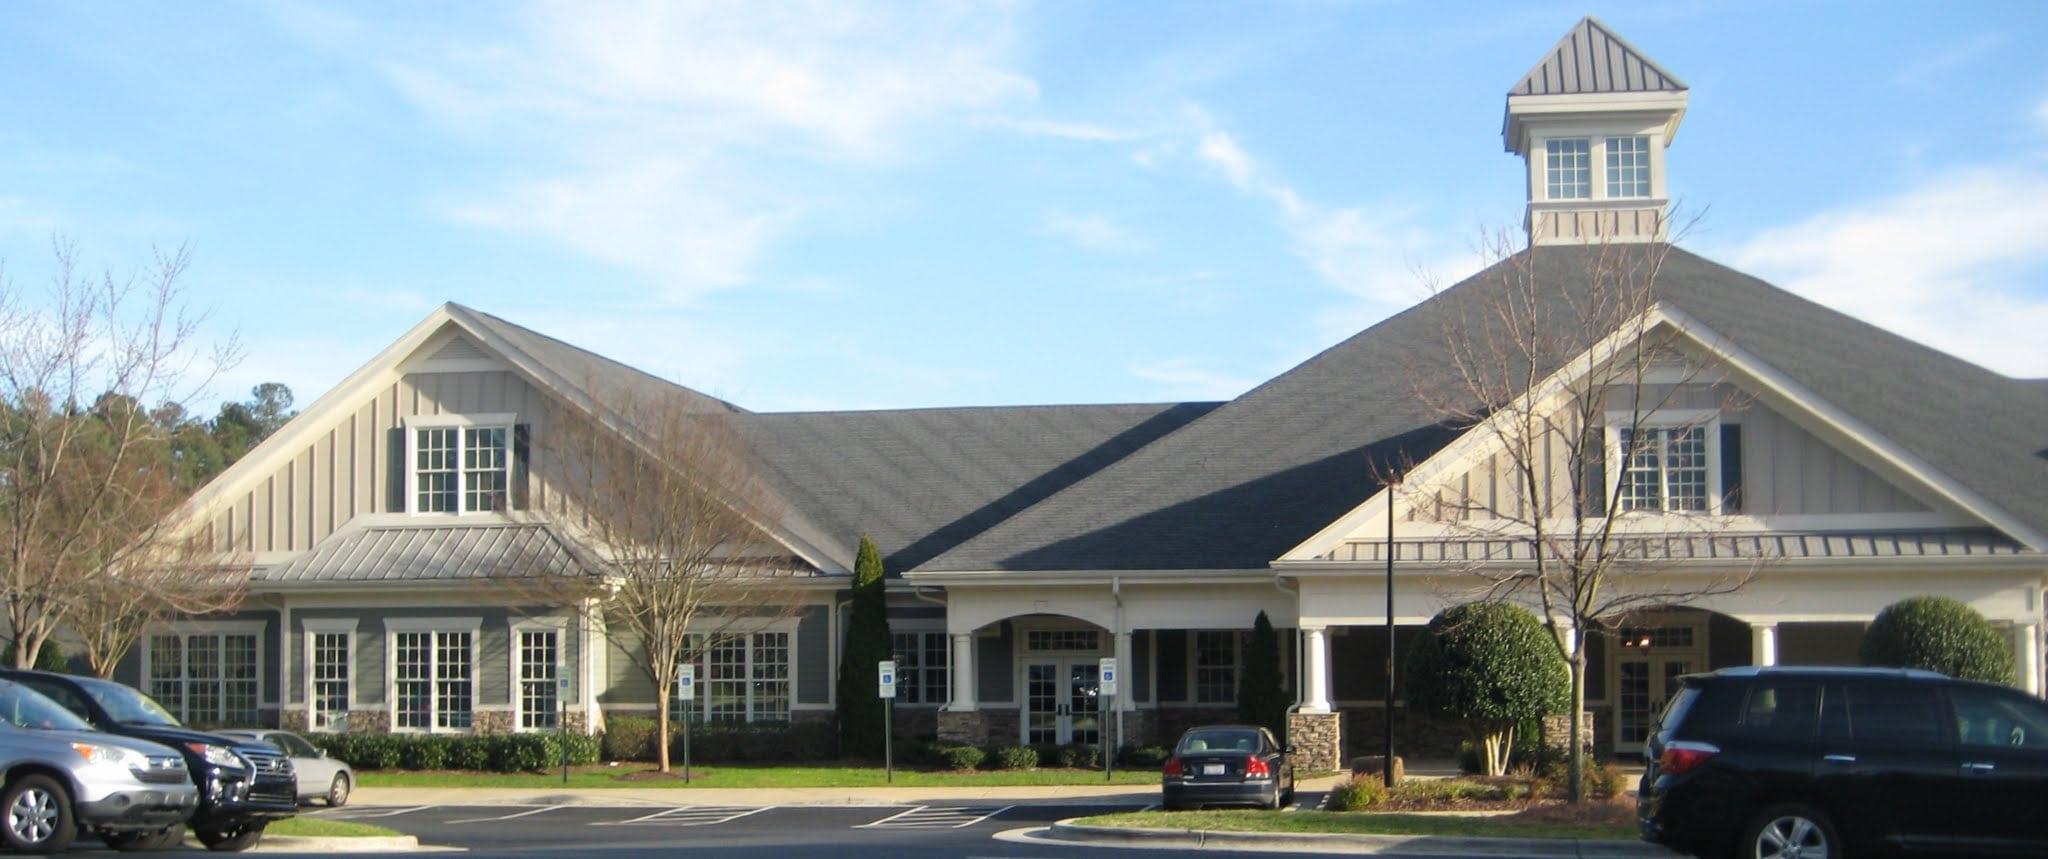 North Hills Club, Best Raleigh Neighborhoods, Midtown, North Hills